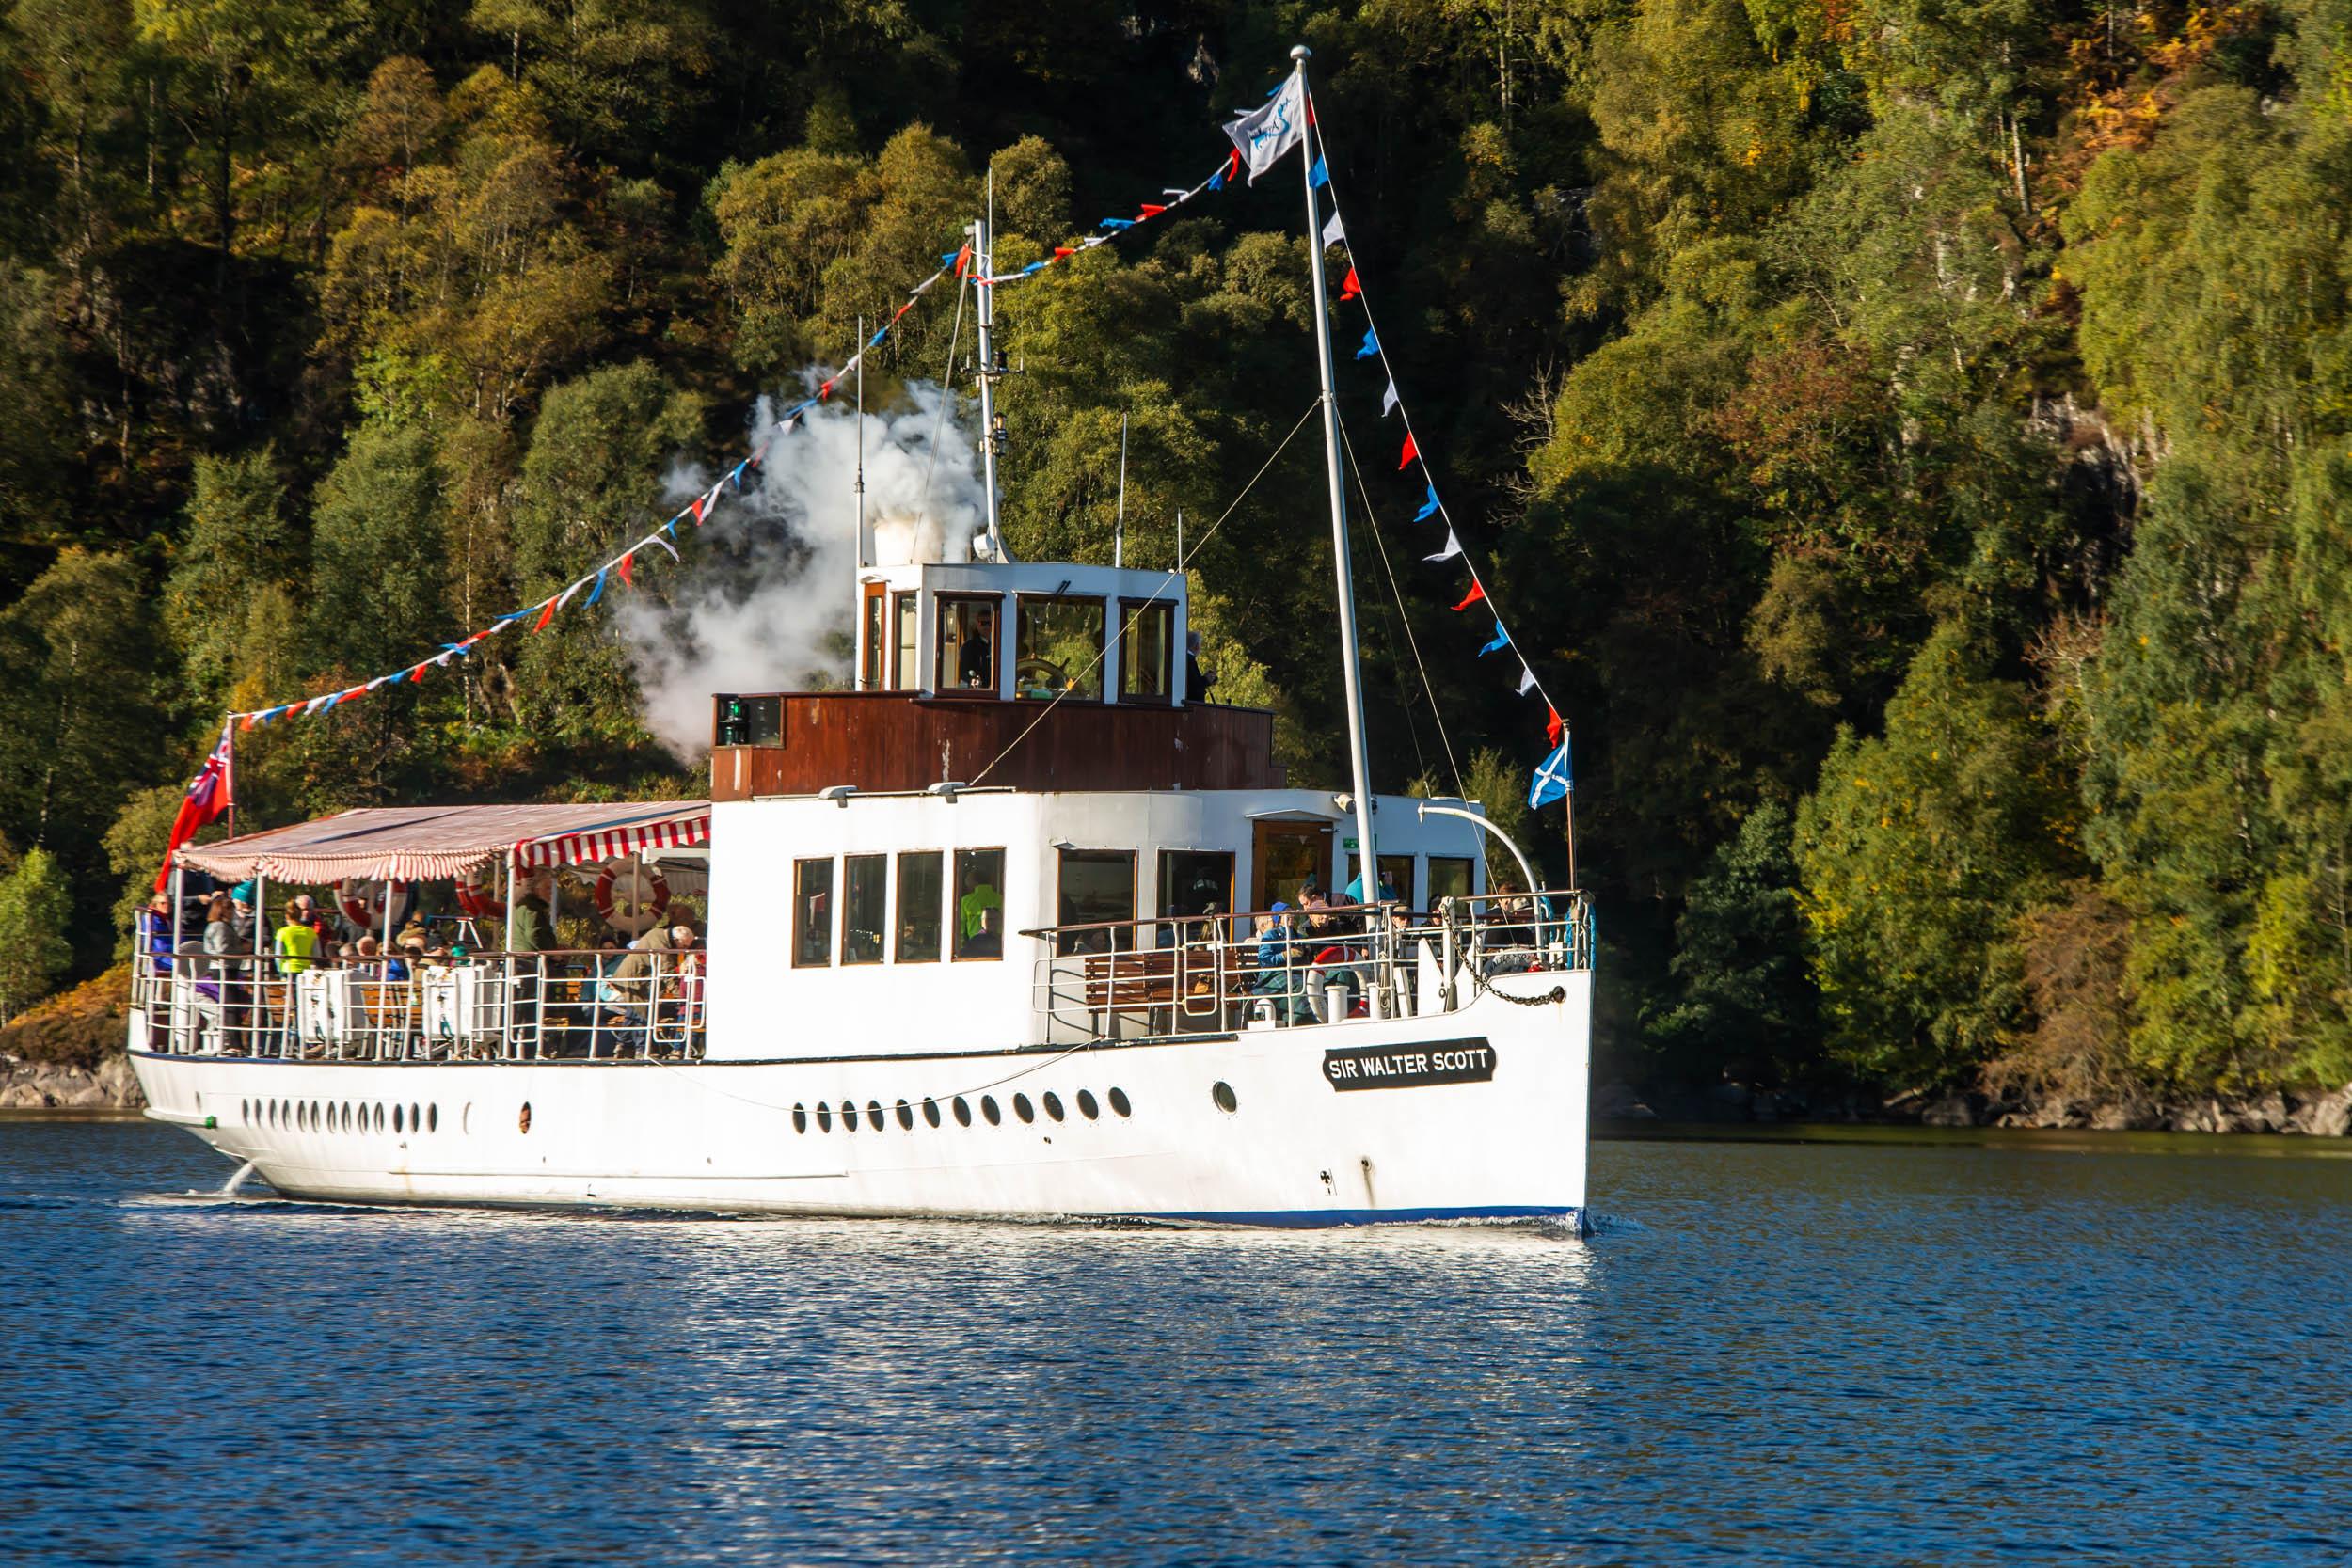 Marketing Support for Loch Katrine and Sir Walter Scott Steamship.